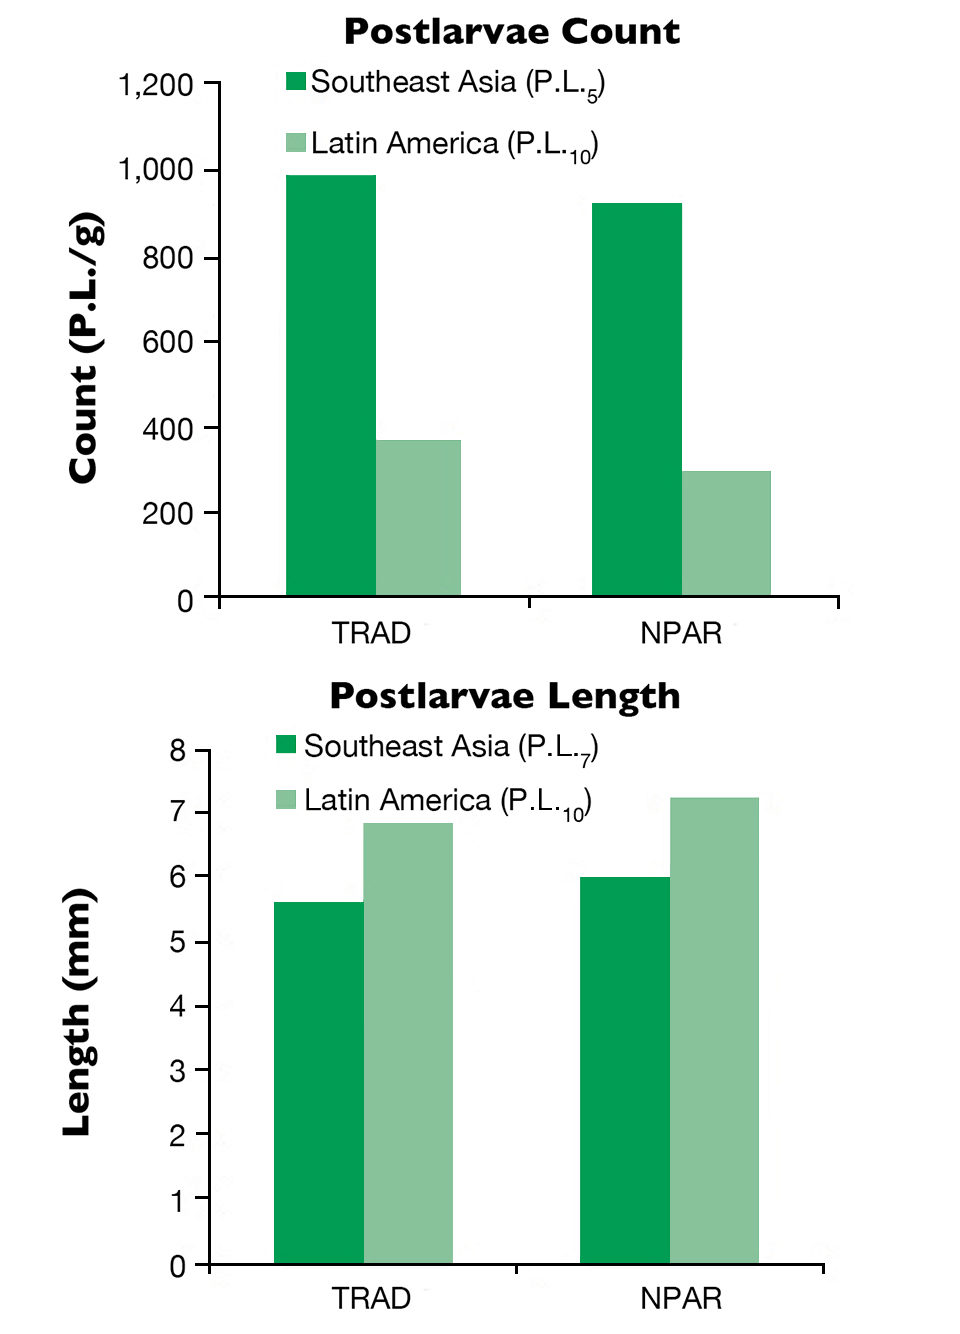 Postlarvae counts